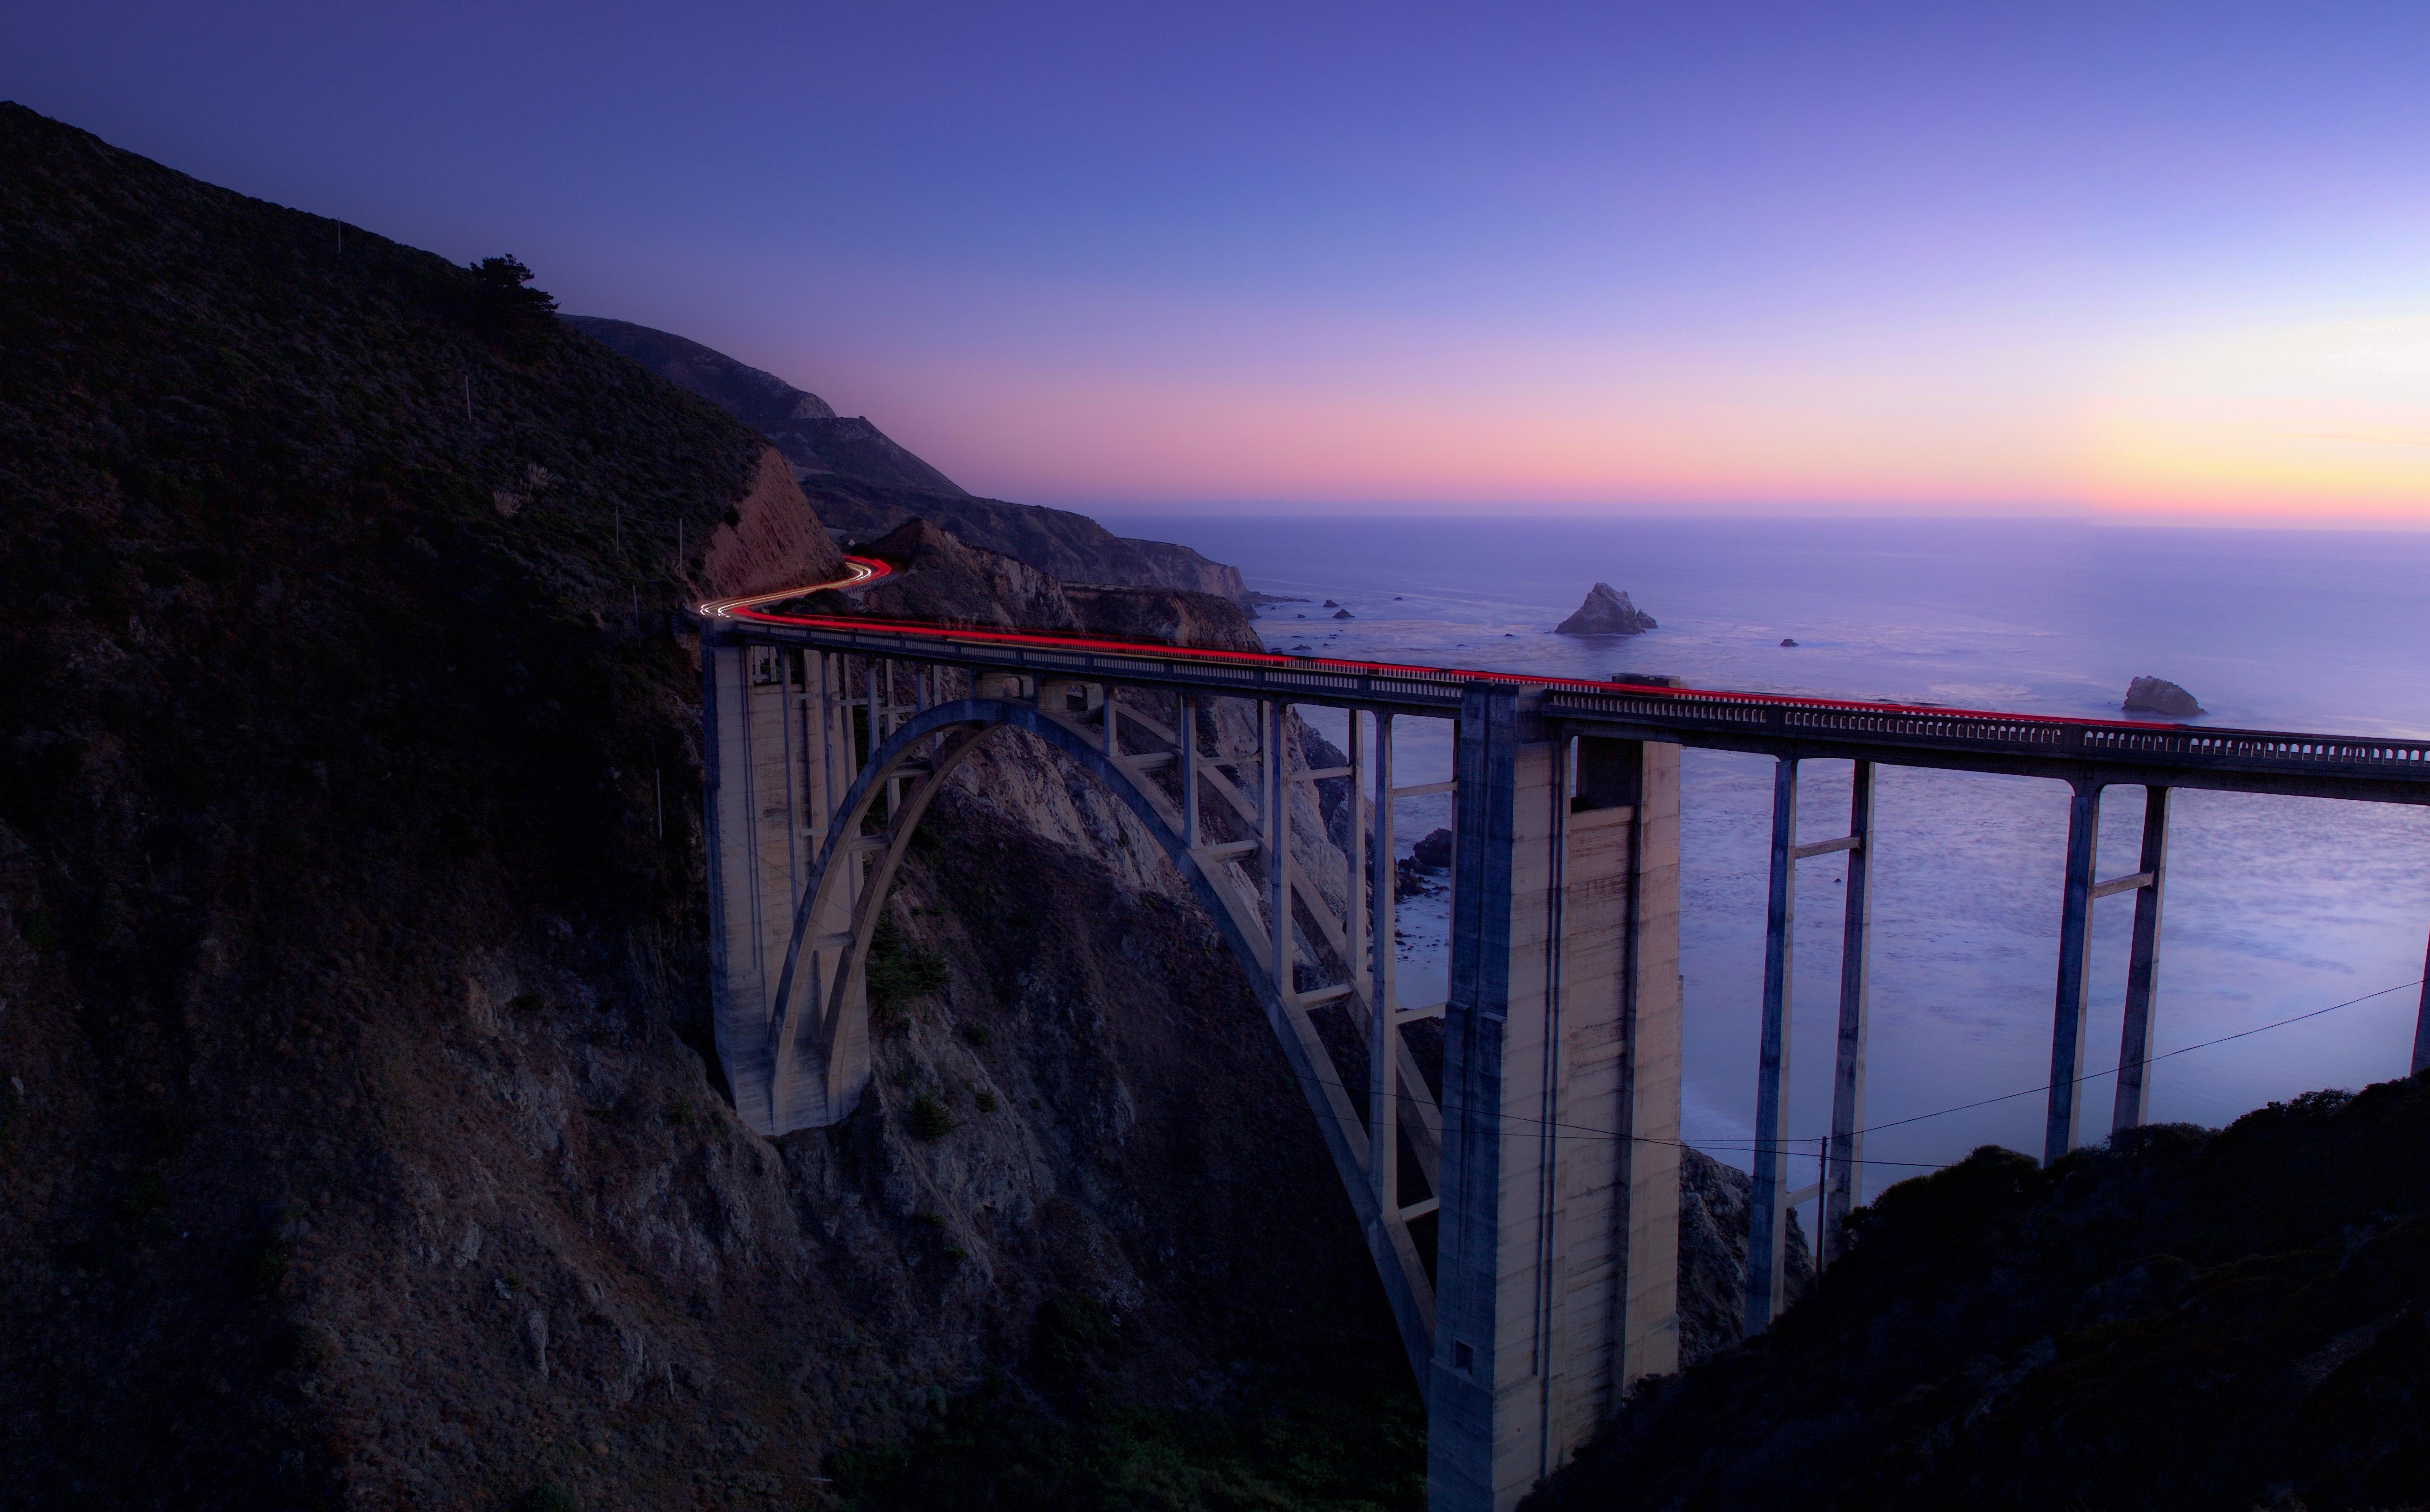 Time lapse photography of cars running on bridge near ocean